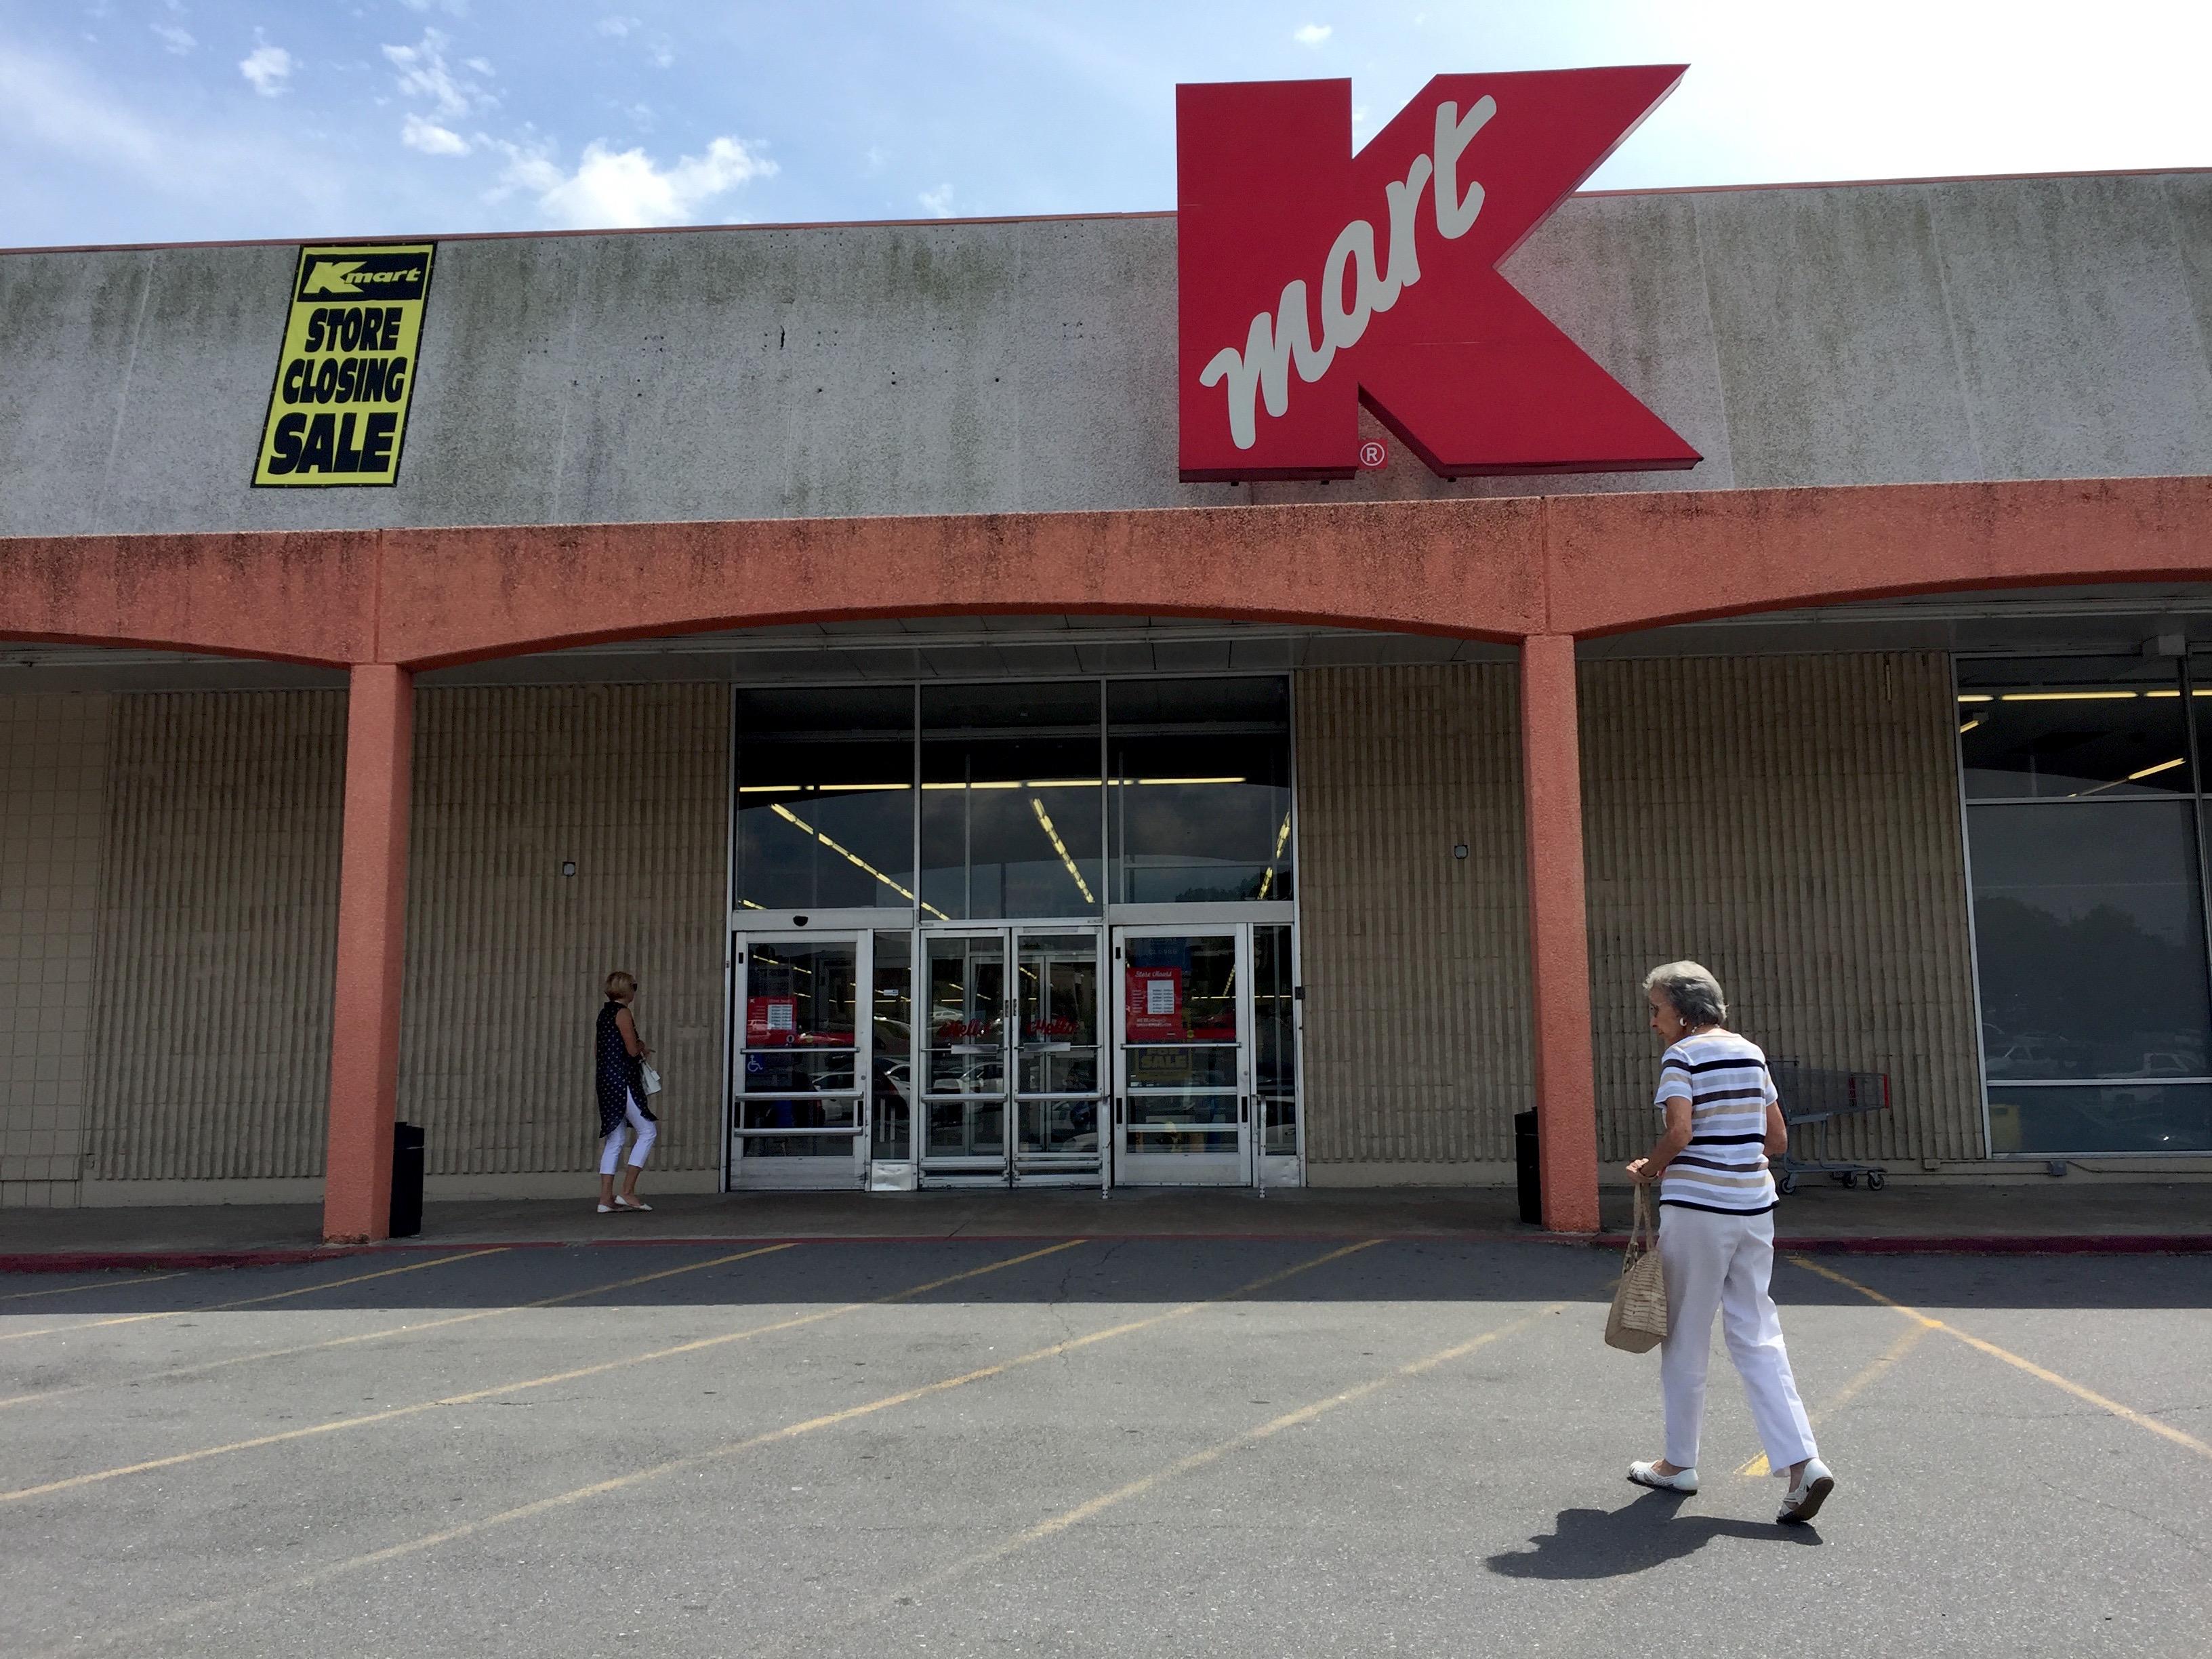 100410530bd Shoppers make their way inside the Kmart store at 10901 N. Rodney Parham  Road in west Little Rock. BRANDON RIDDLE Arkansas Online